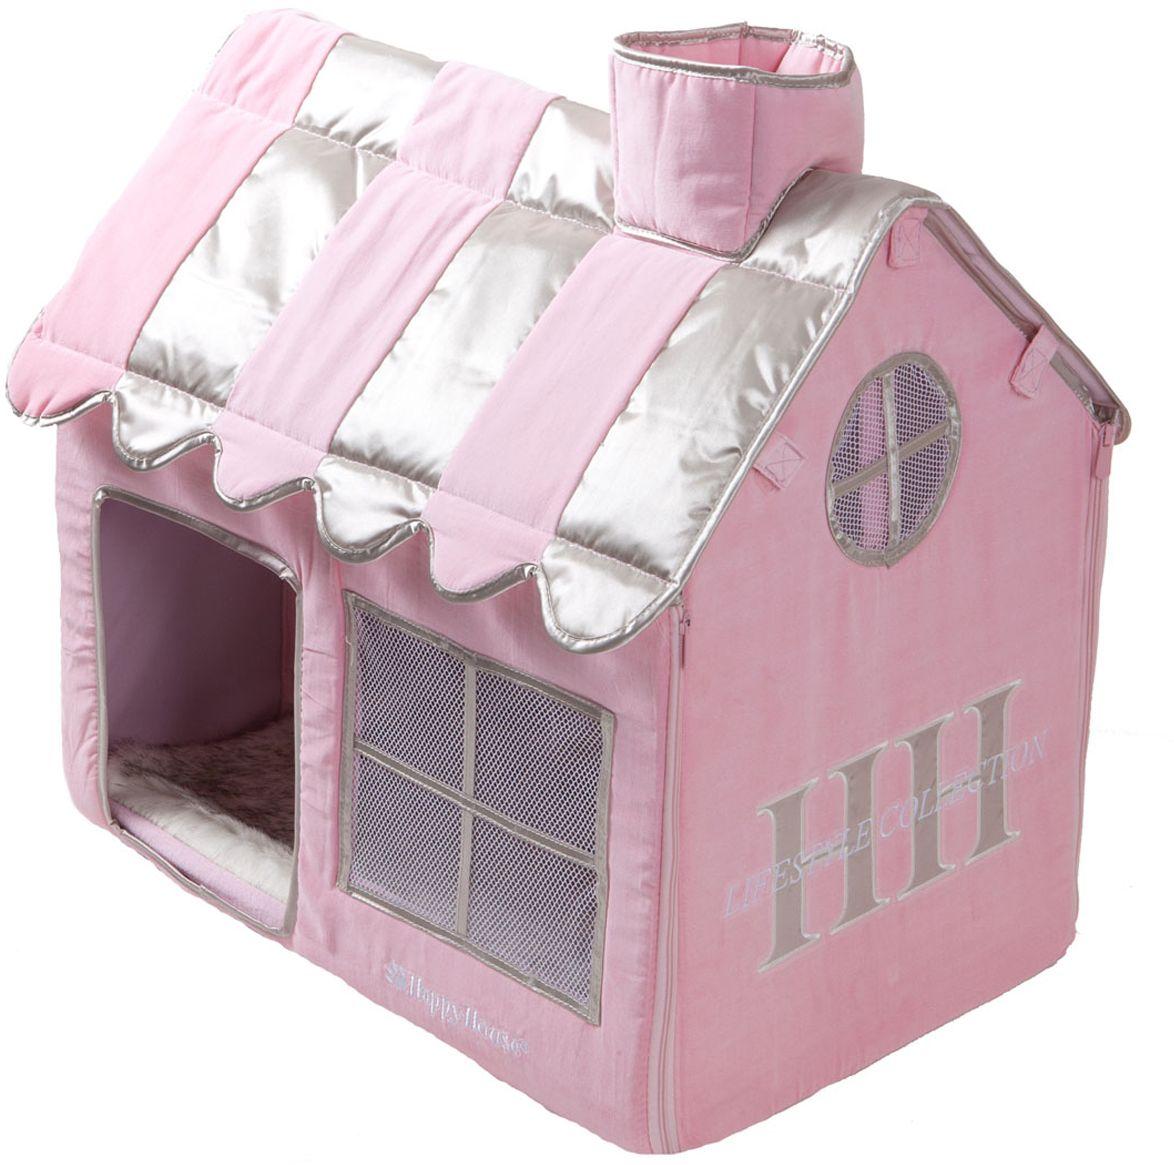 Вилла для кошек Happy House Cat Lifestyle, цвет: розовый, 62х42х59 см8480-1